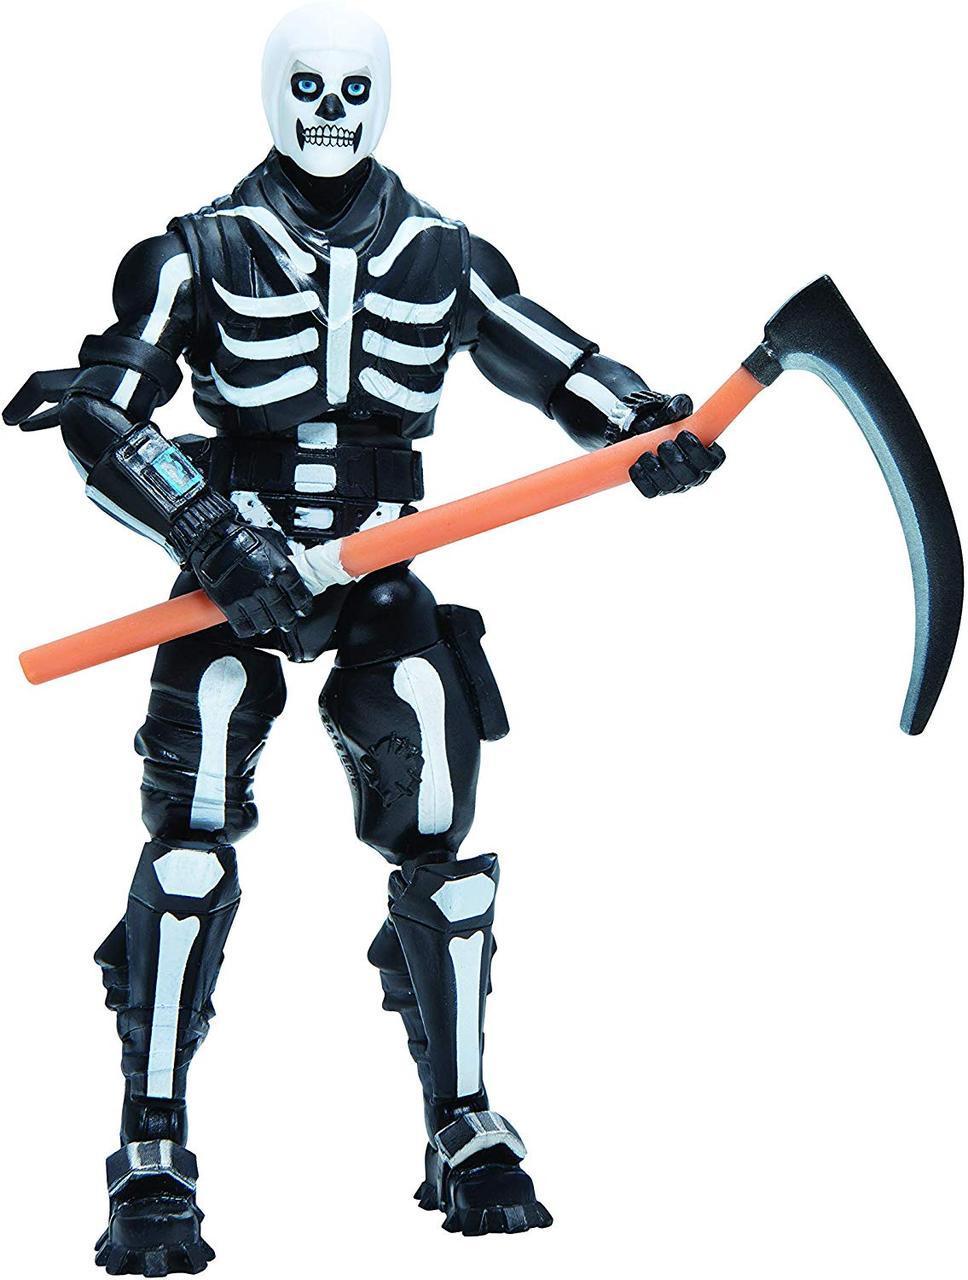 Фортнайт Фигурка Опустошитель Скул Трупер от Jazwares  Fortnite Solo Mode Skull Trooper